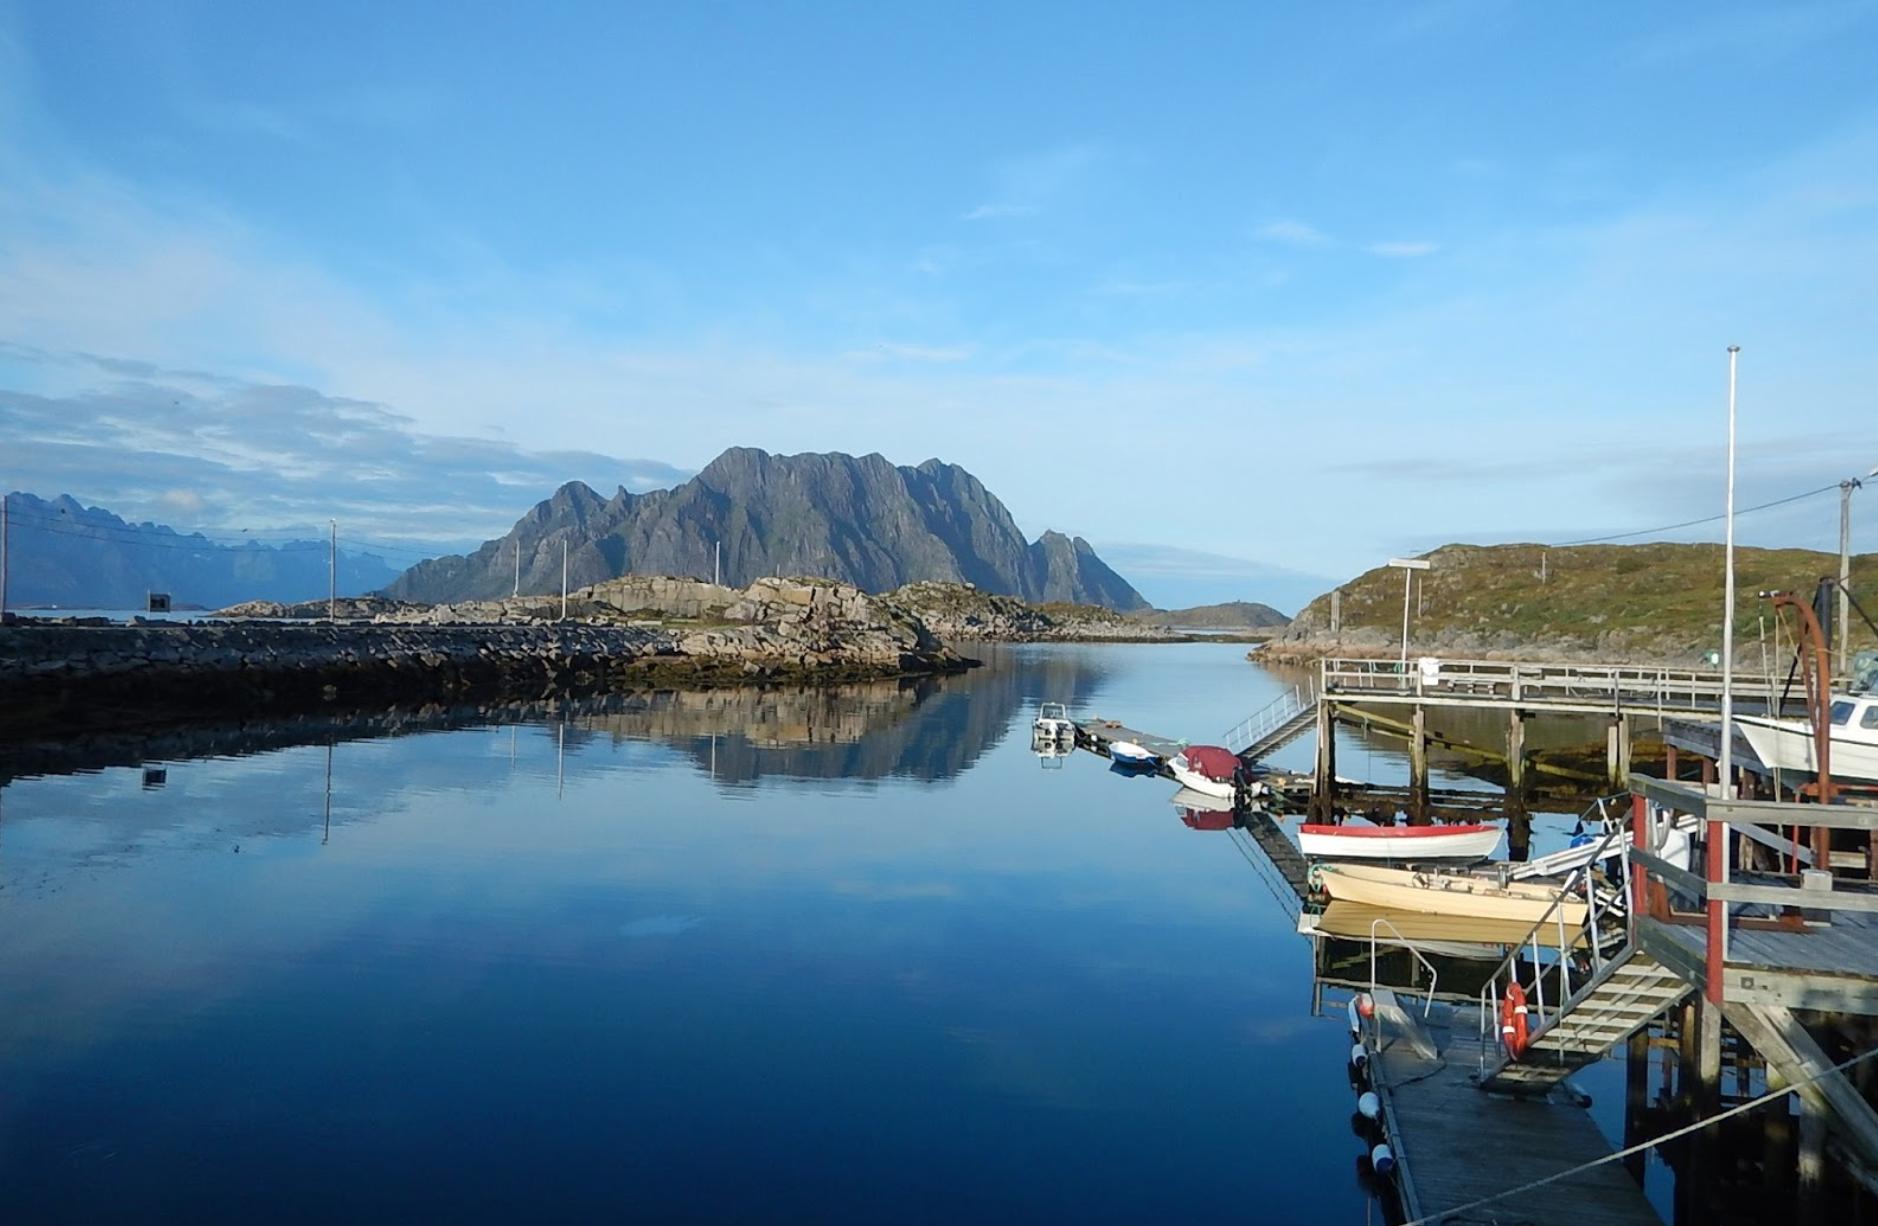 Skrova, Lofoten Islands in Northern Norway.Photo by:François & Valérie